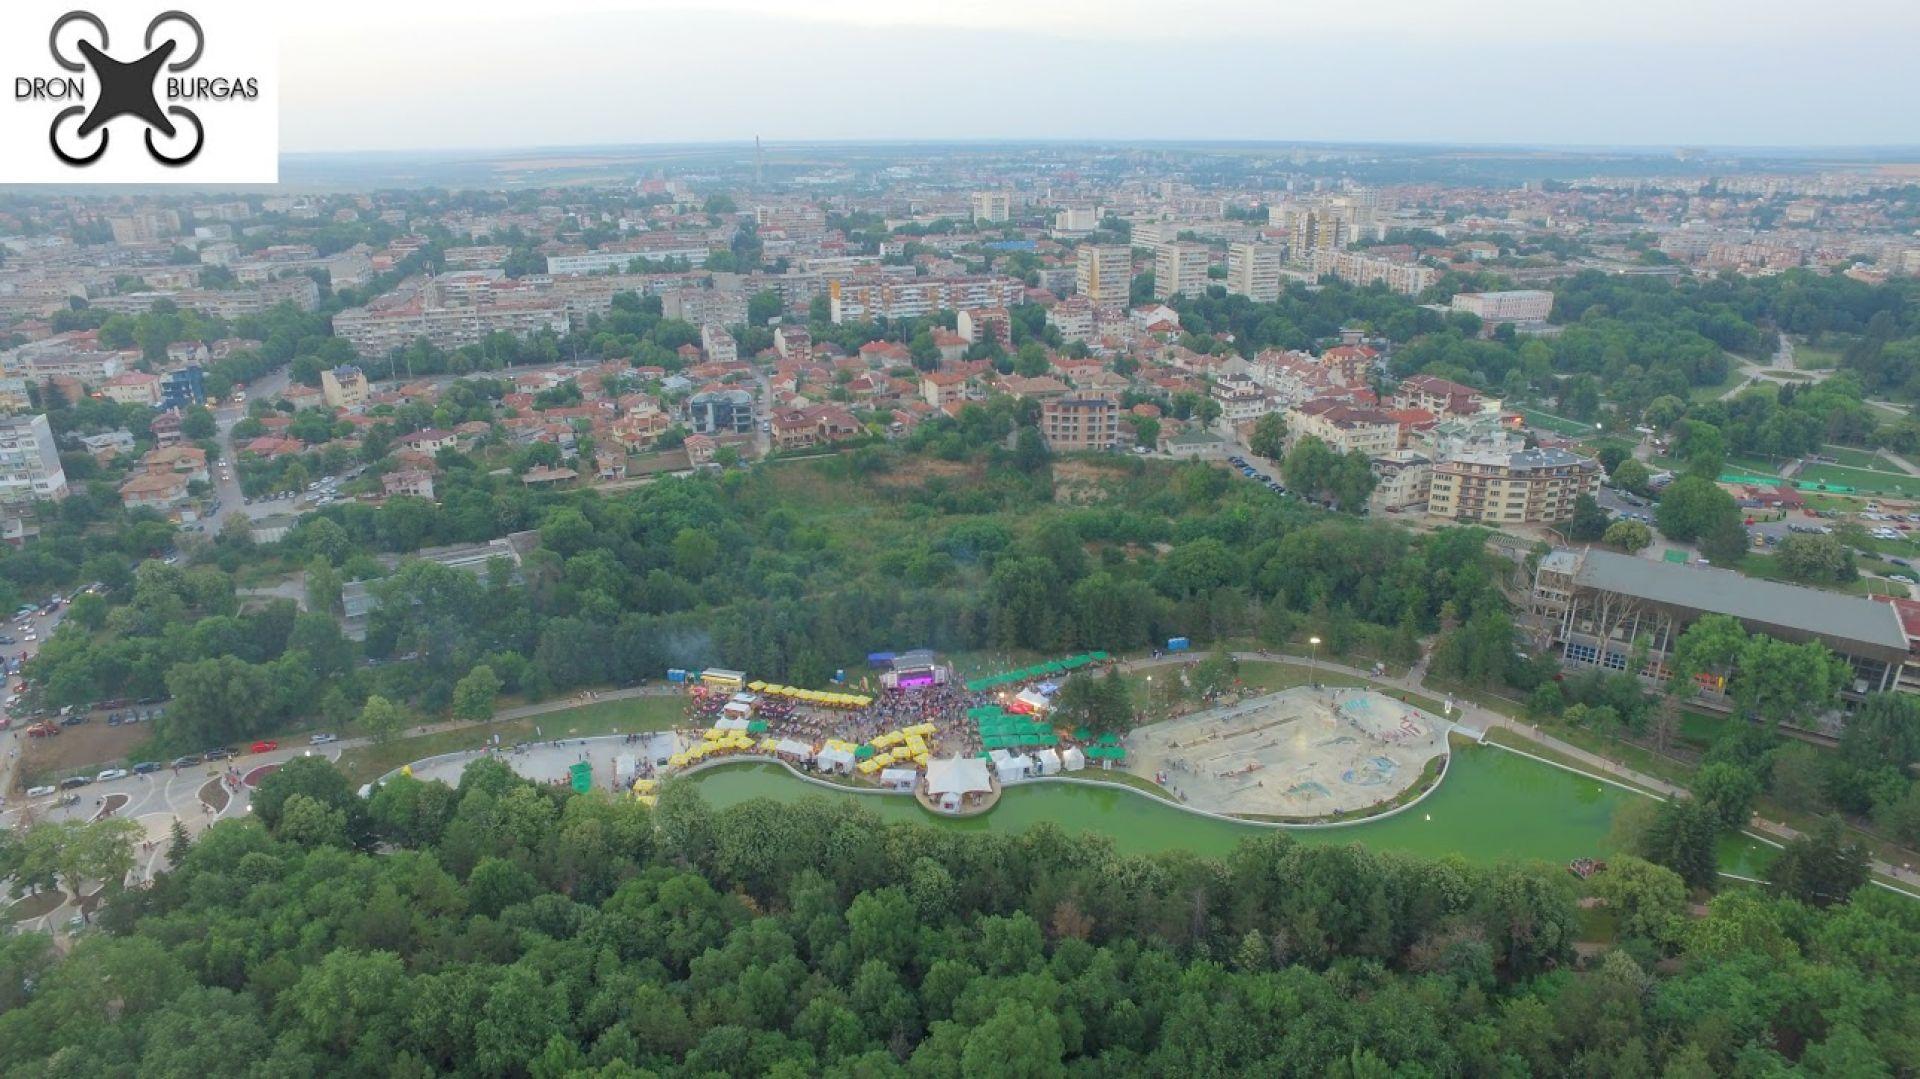 Дрон Бургас единствен показа фестивала отвисоко, като бяха запечатани красотите на Добрич